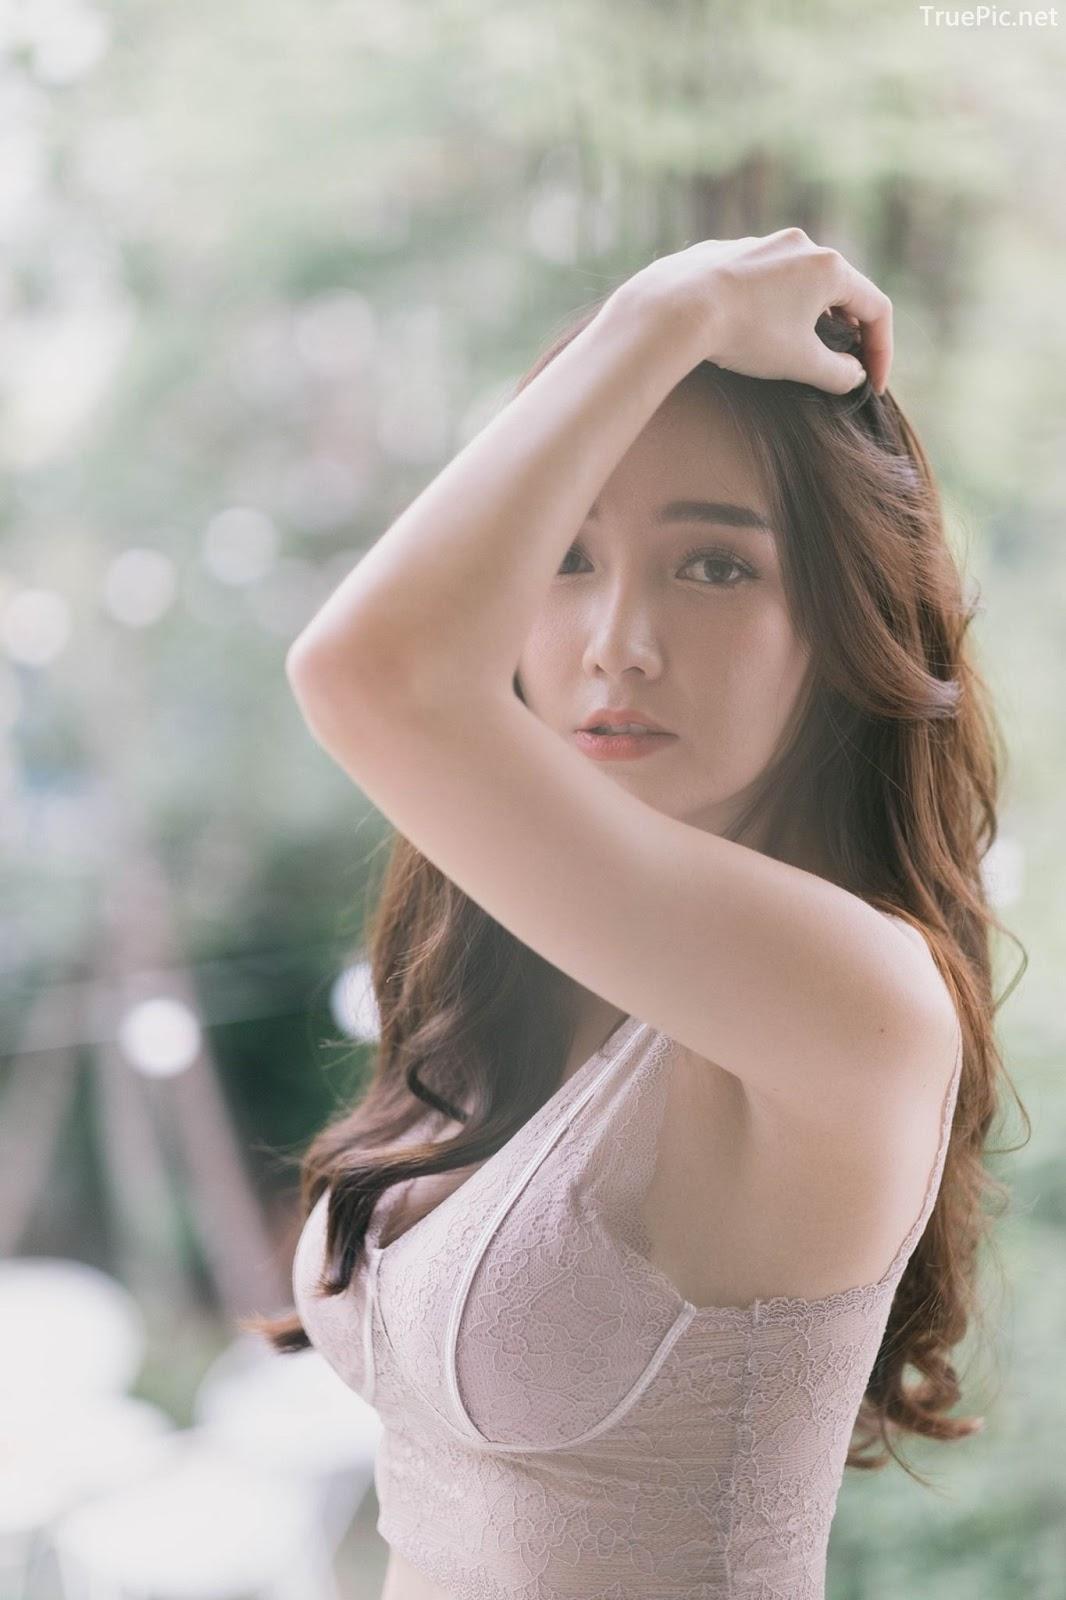 Thailand Angel model Rossarin Klinhom - Beautiful Smile Angel Pics